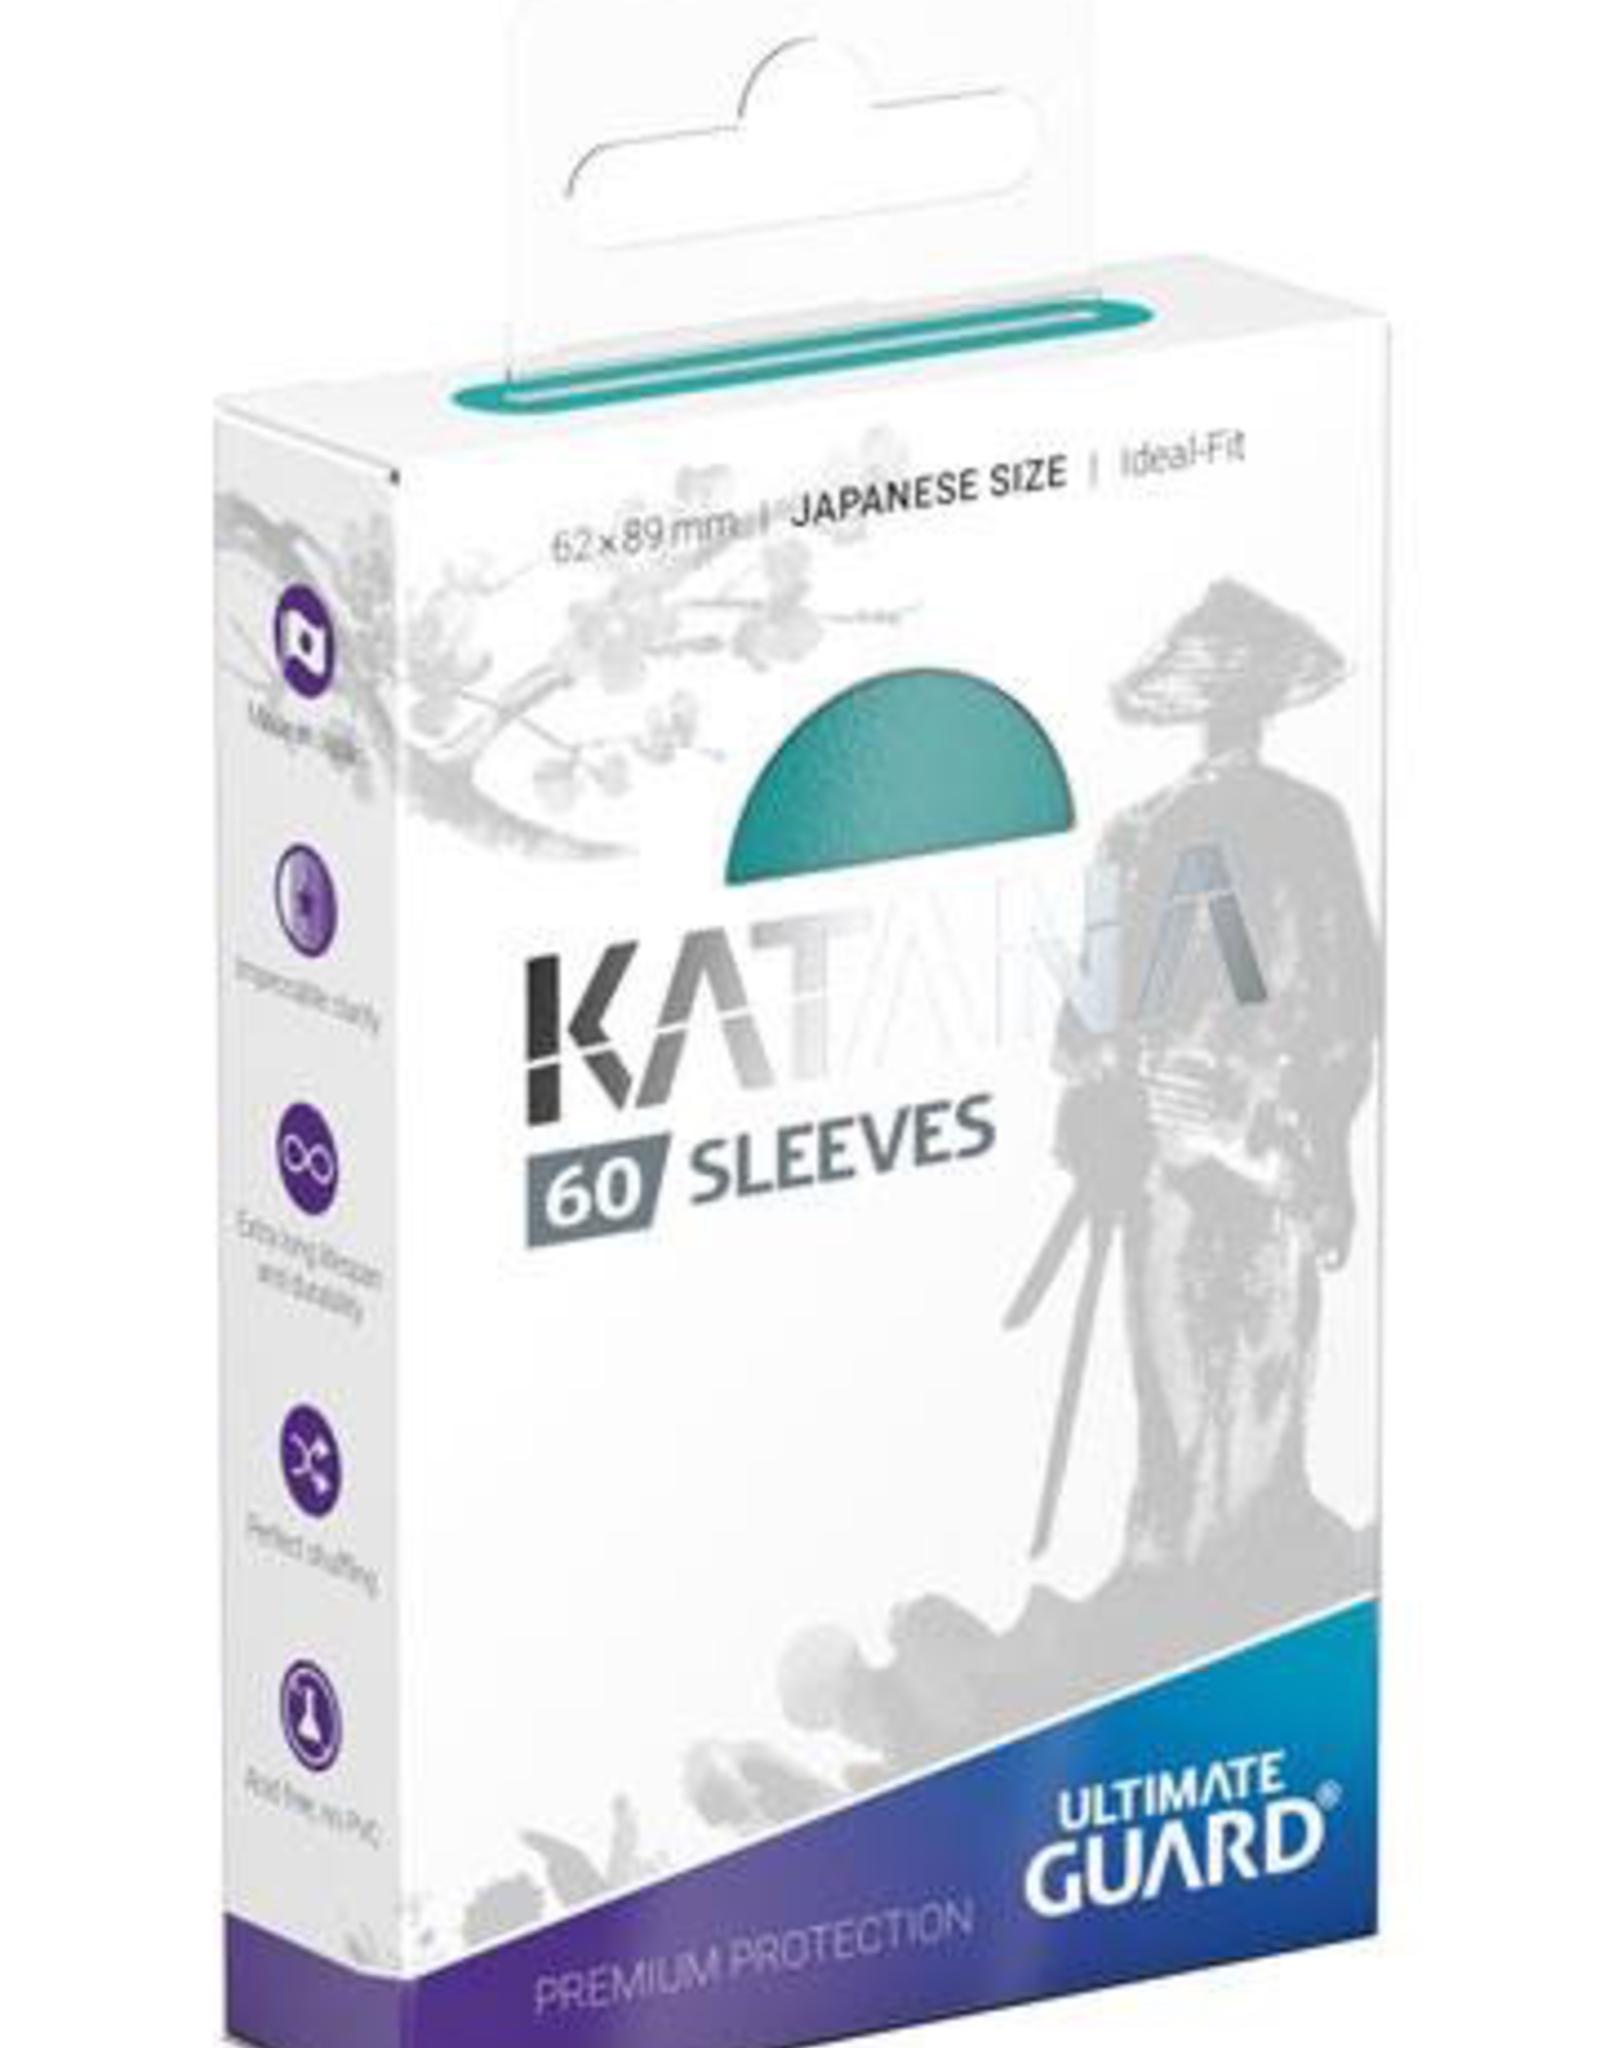 UG - Small Sleeves Ultimate Guard Katana Sleeves Japanische Größe<br /> Türkis (60)